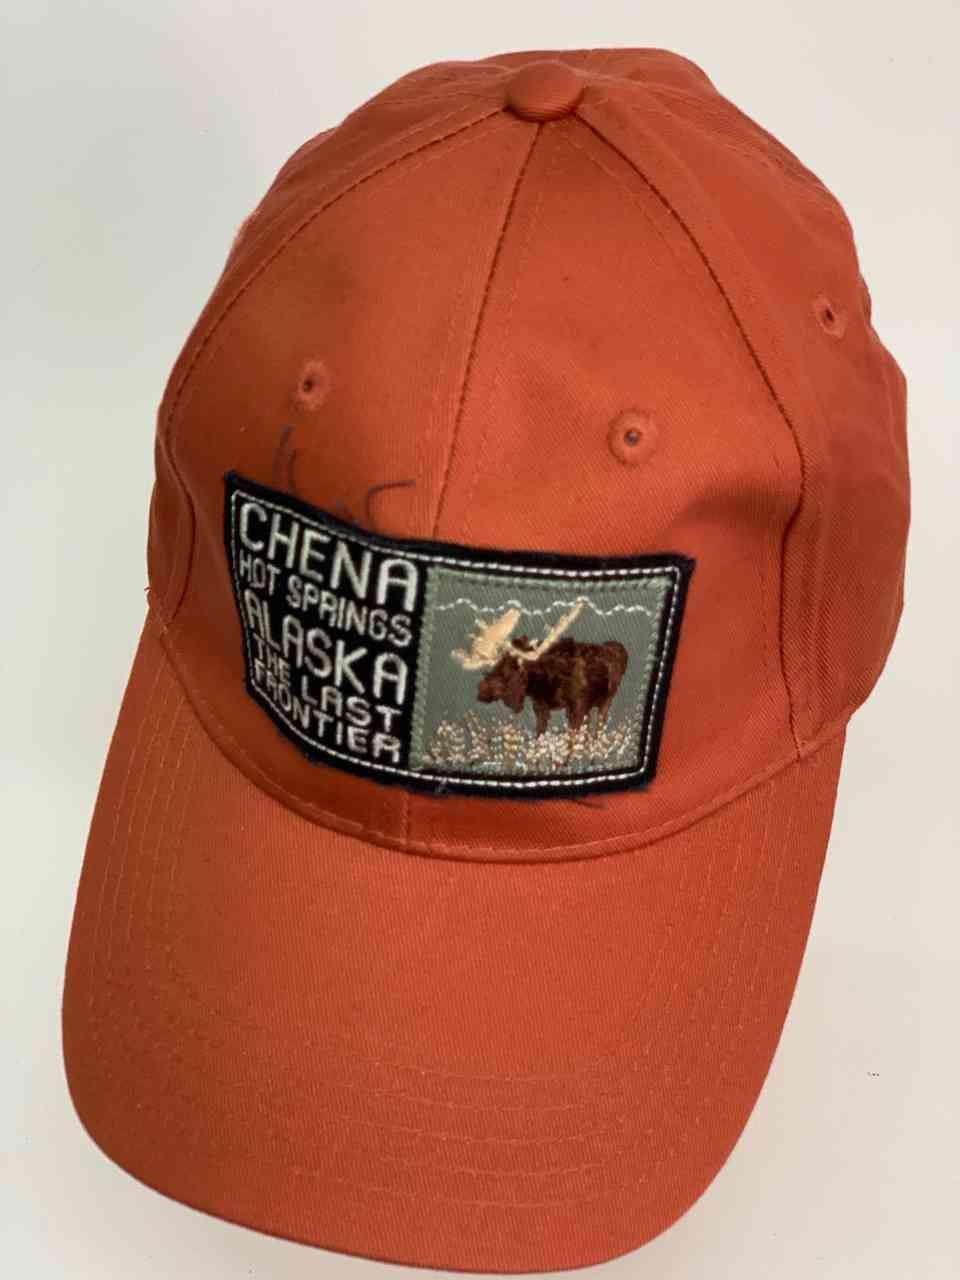 Оранжевая кепка Chеna Hot Springs Alaska